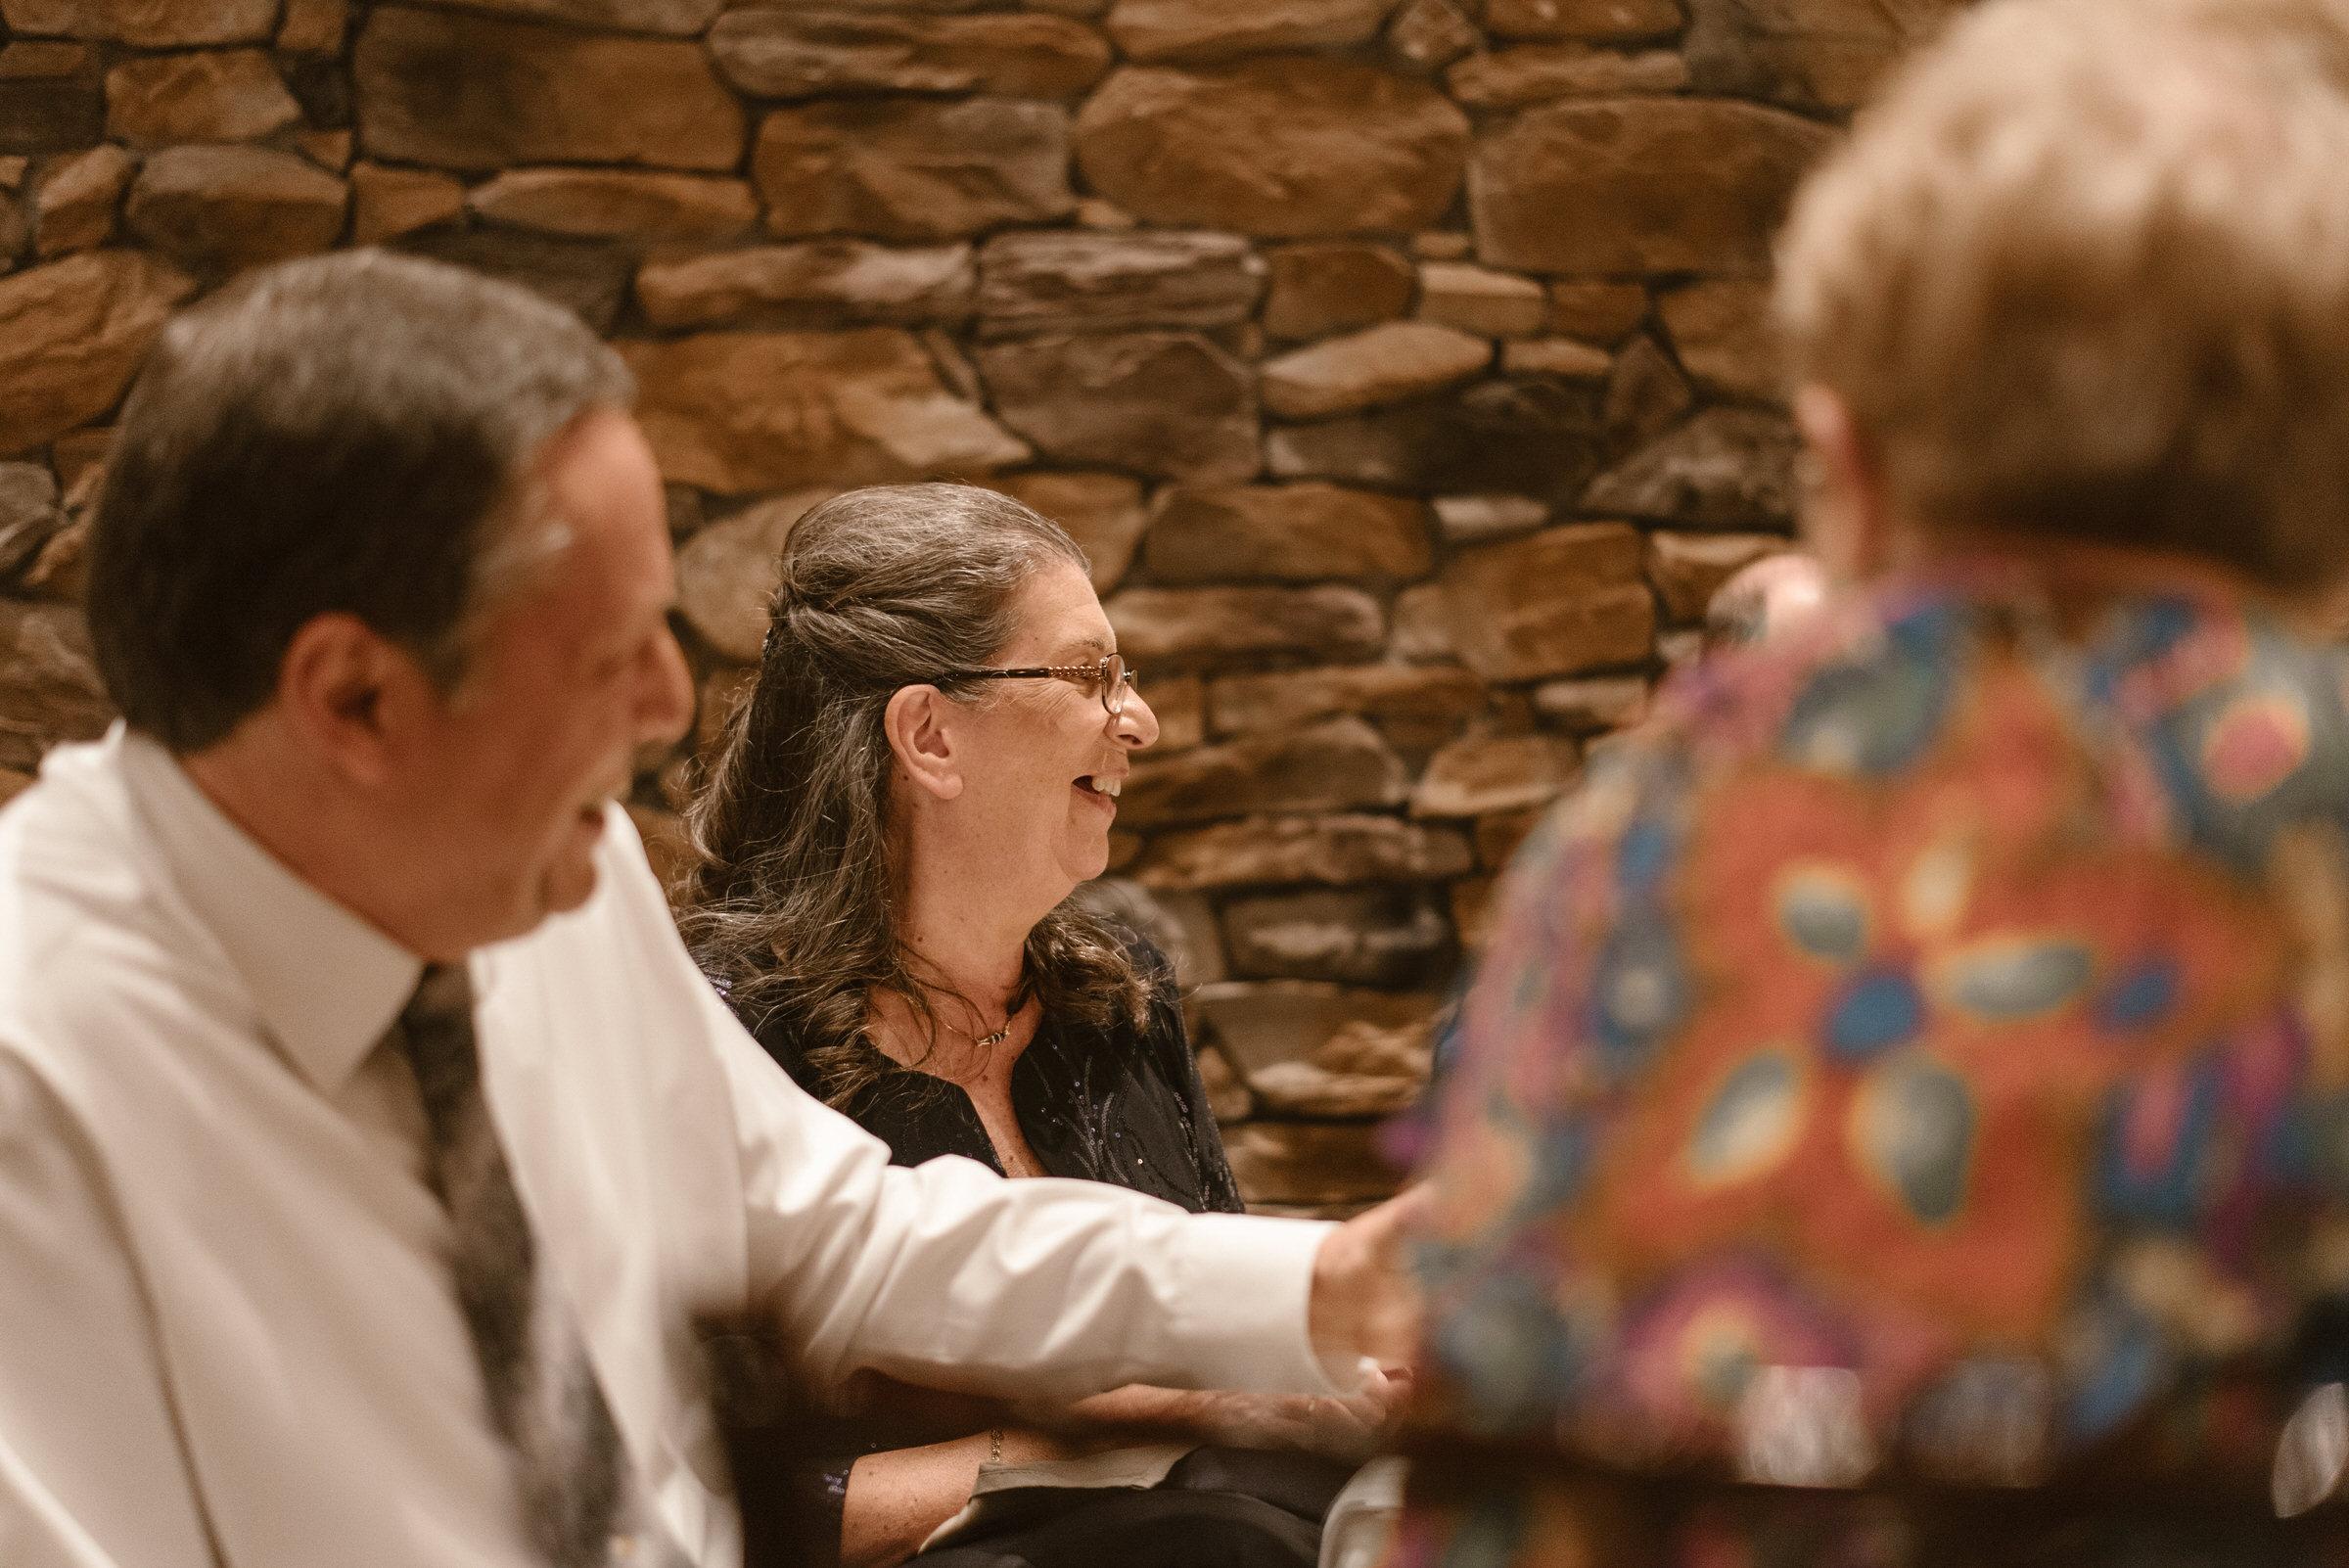 Wilderness-Ridge-Lincoln-Nebraska-Wedding-Kaylie-Sirek-Photography-108.jpg